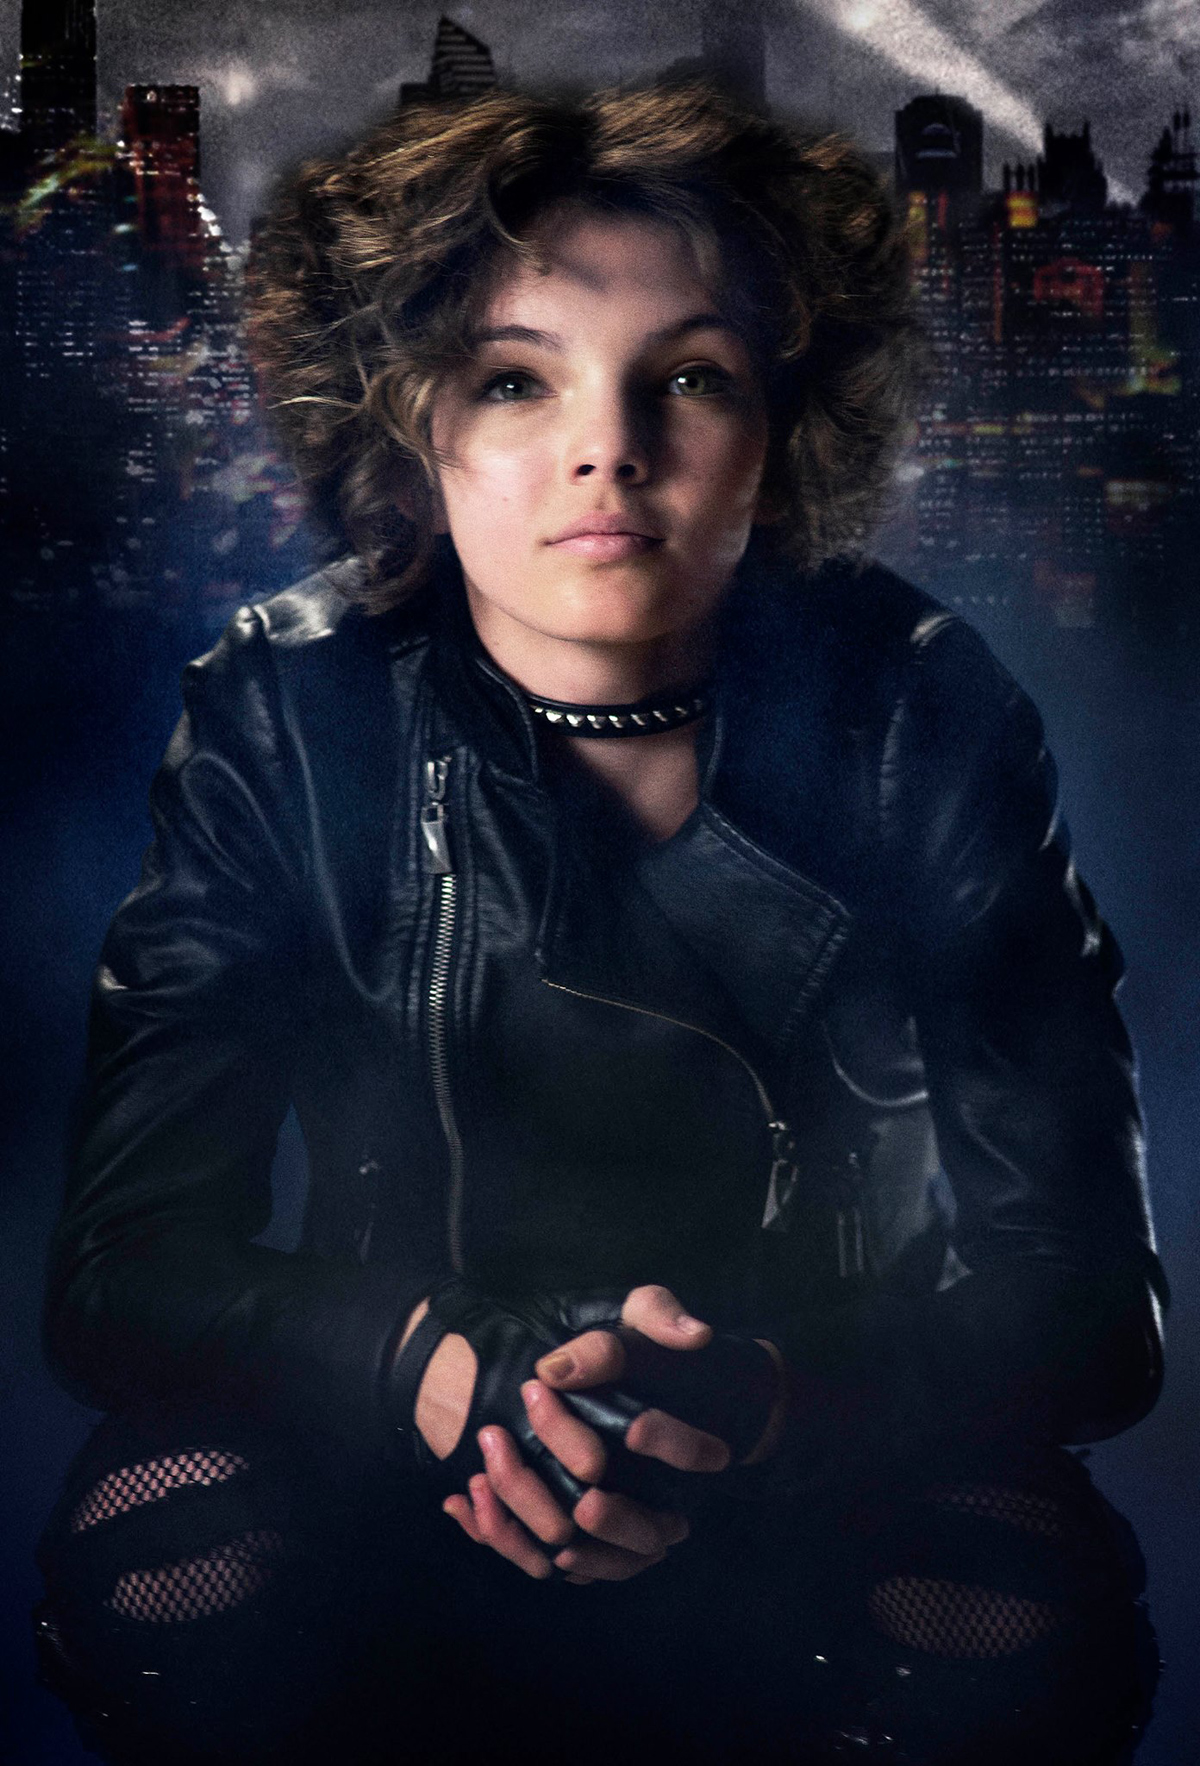 Catwoman - Gotham